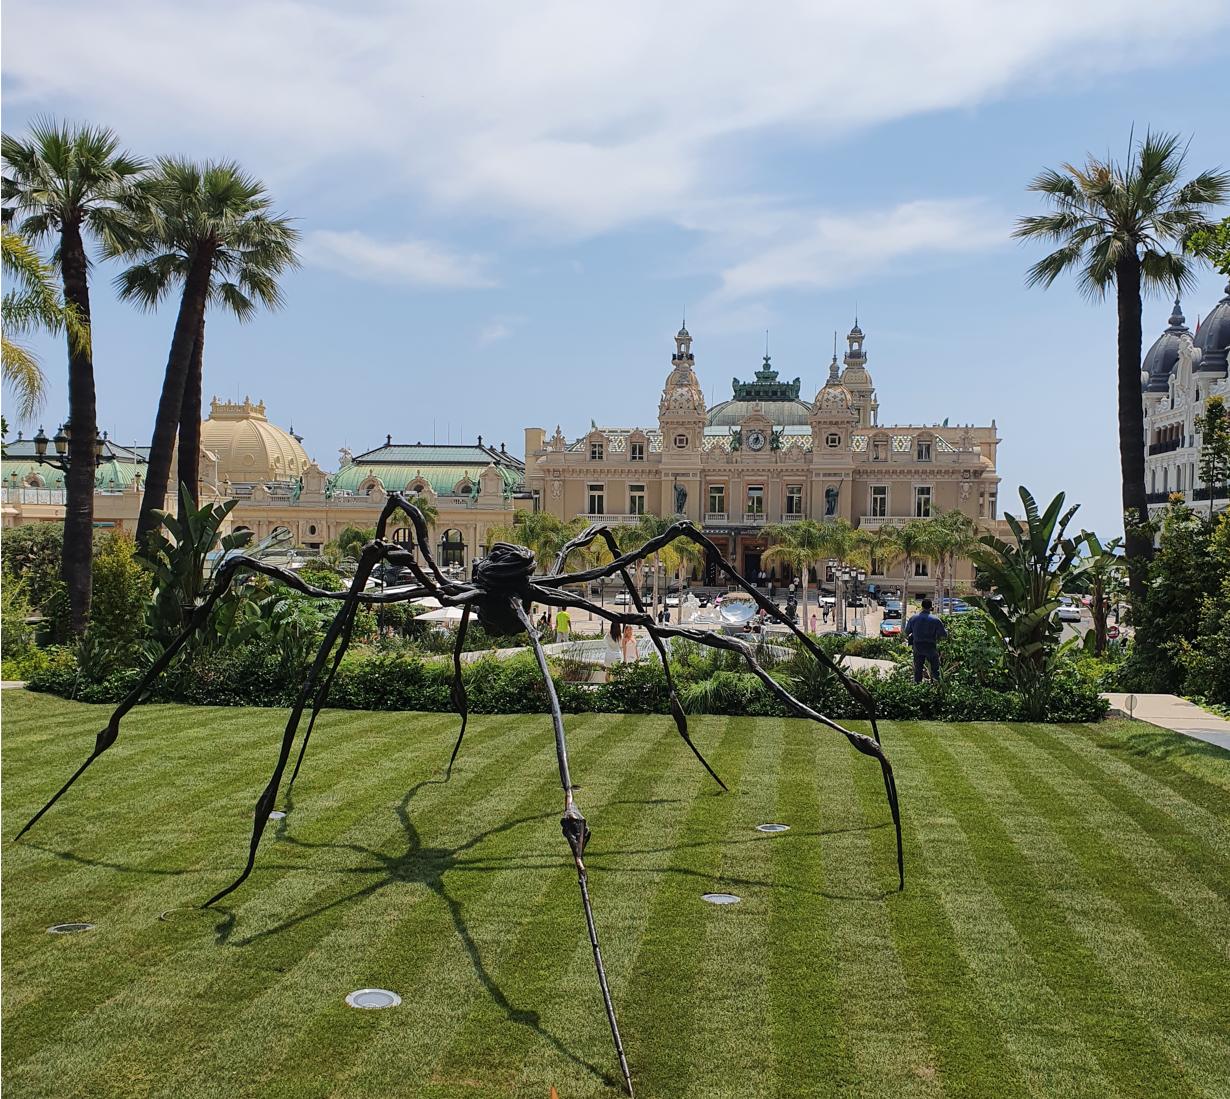 Musée - araignée -Louise bourgeois